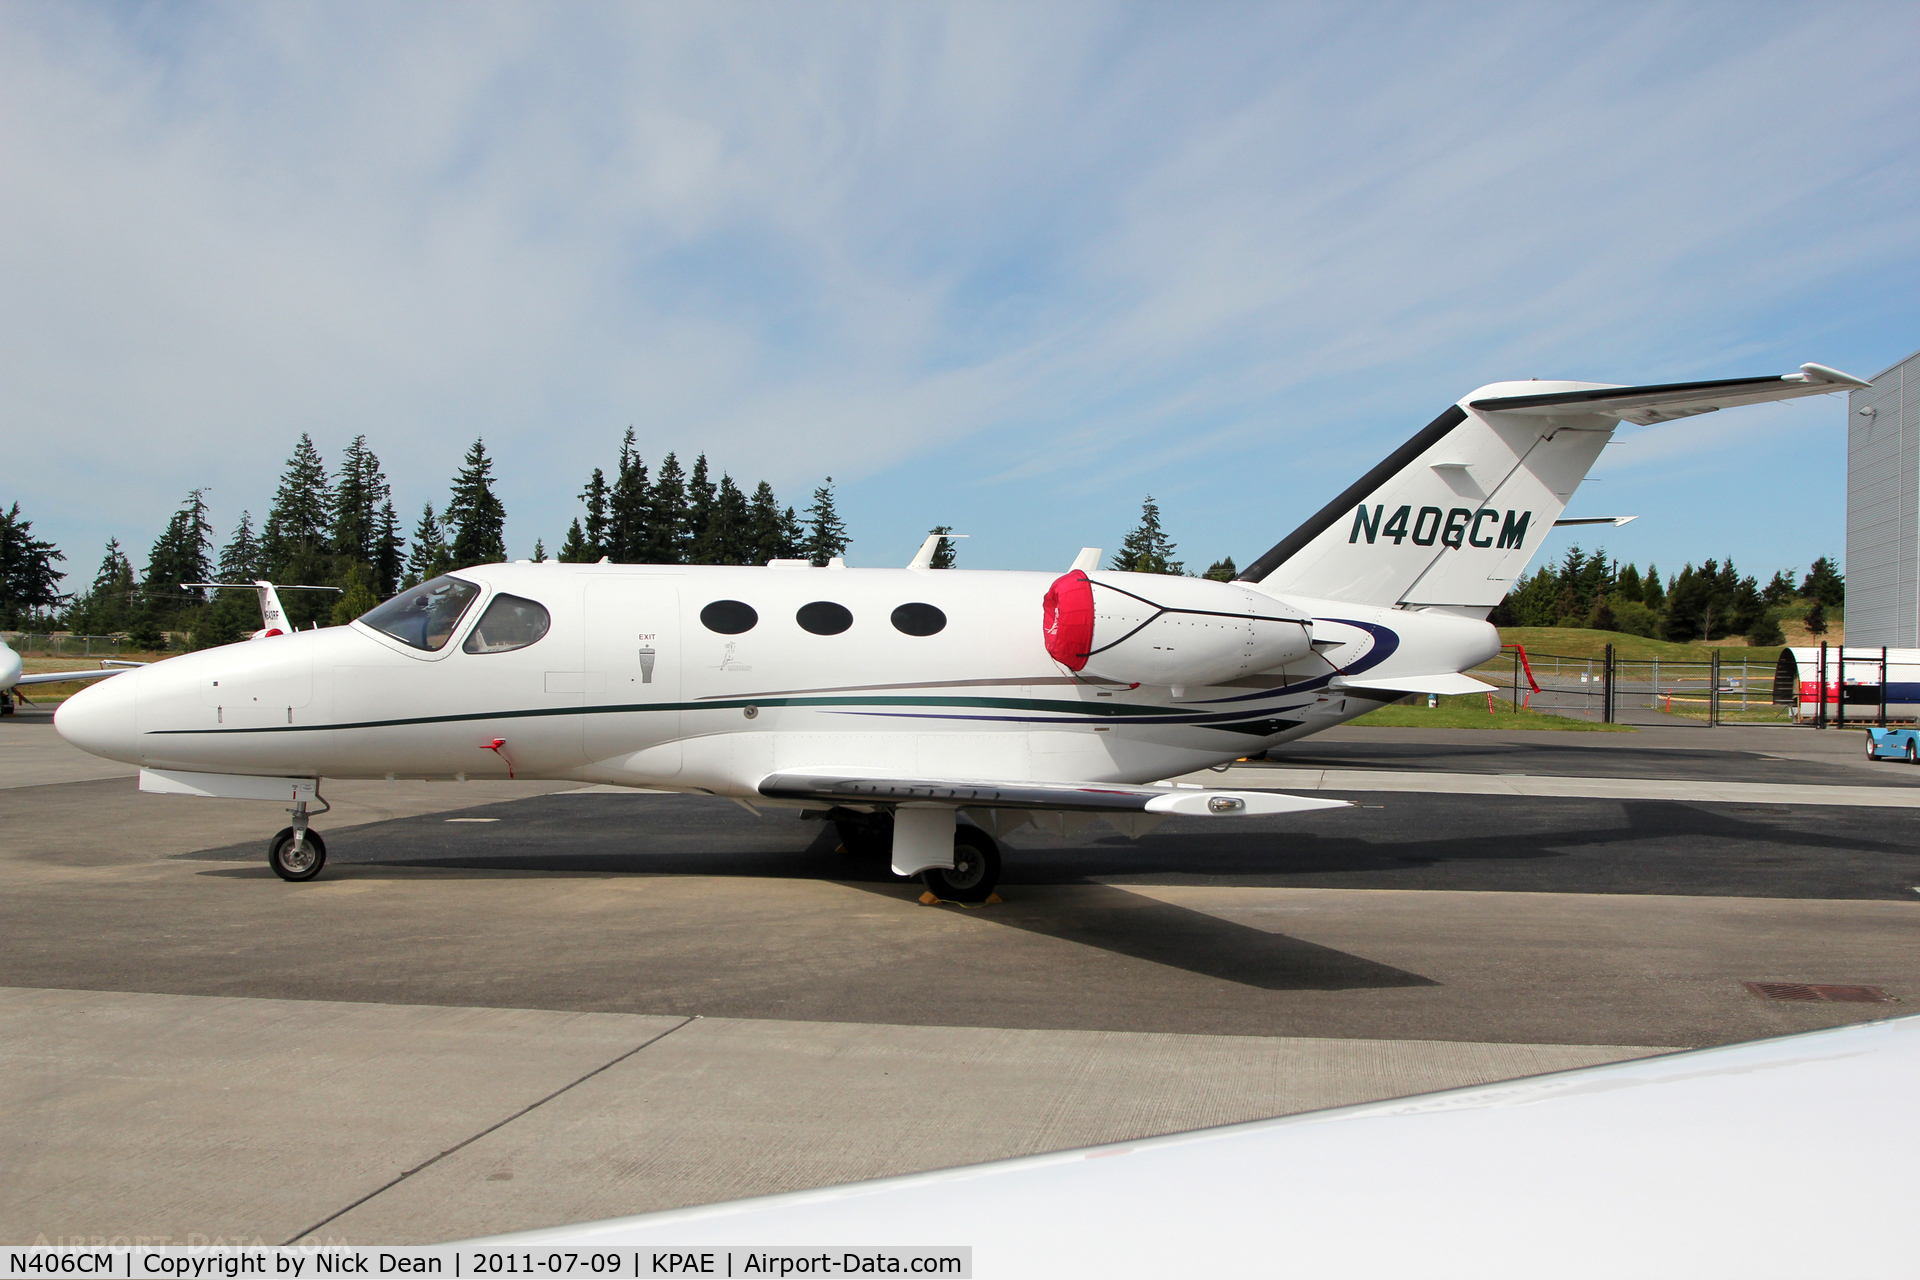 N406CM, 2007 Cessna 510 Citation Mustang Citation Mustang C/N 510-0015, KPAE/PAE